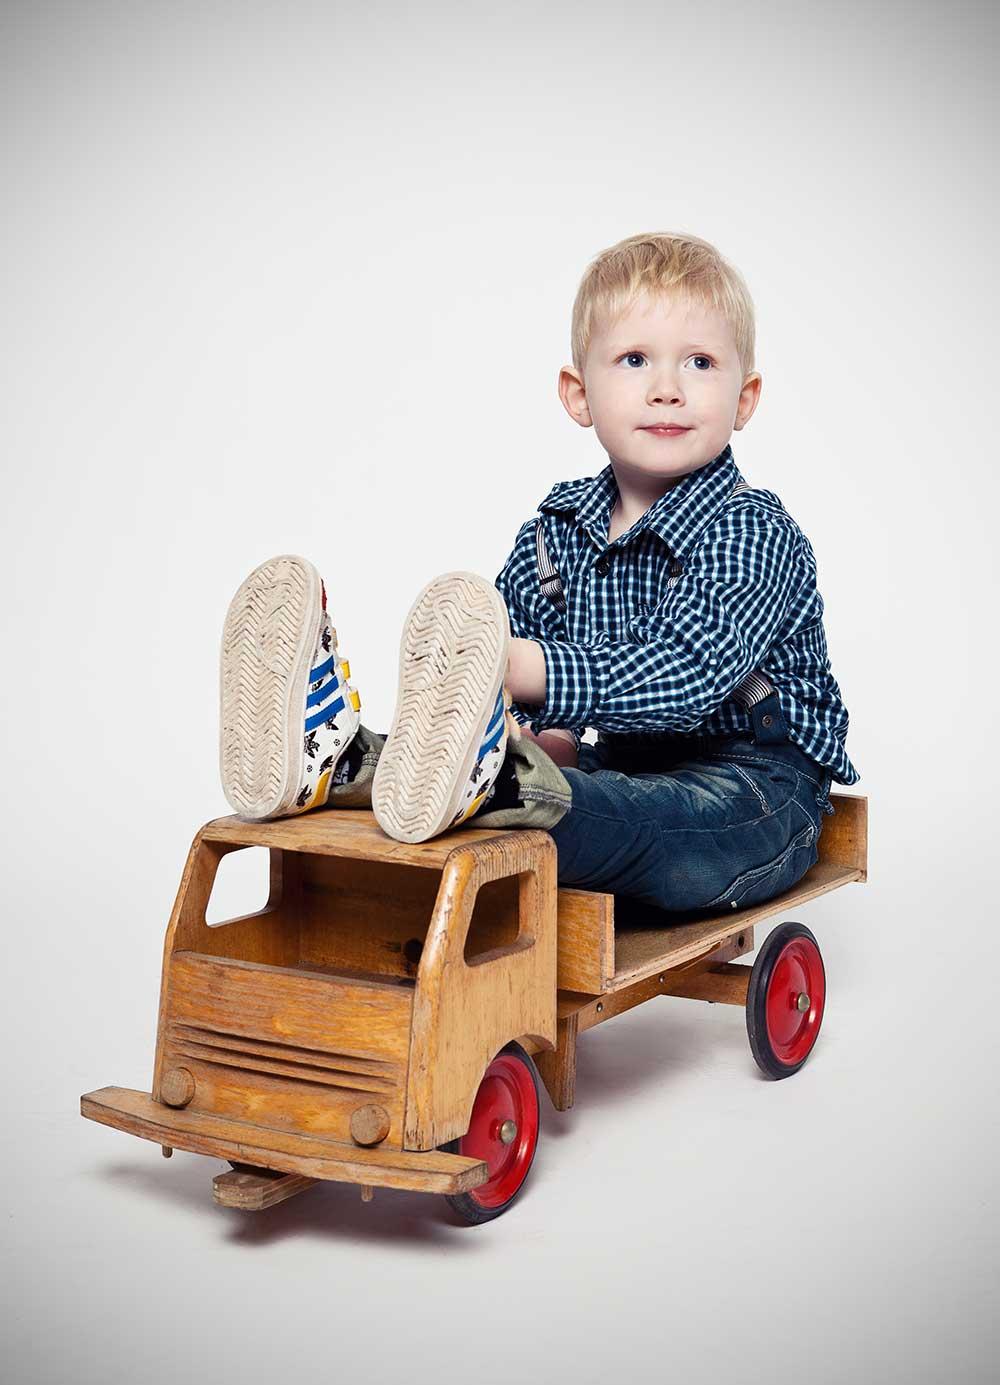 Kinderfotografie, Kathy Hennig, Golden Eyes Fotografie Leipzig, Familienfotos